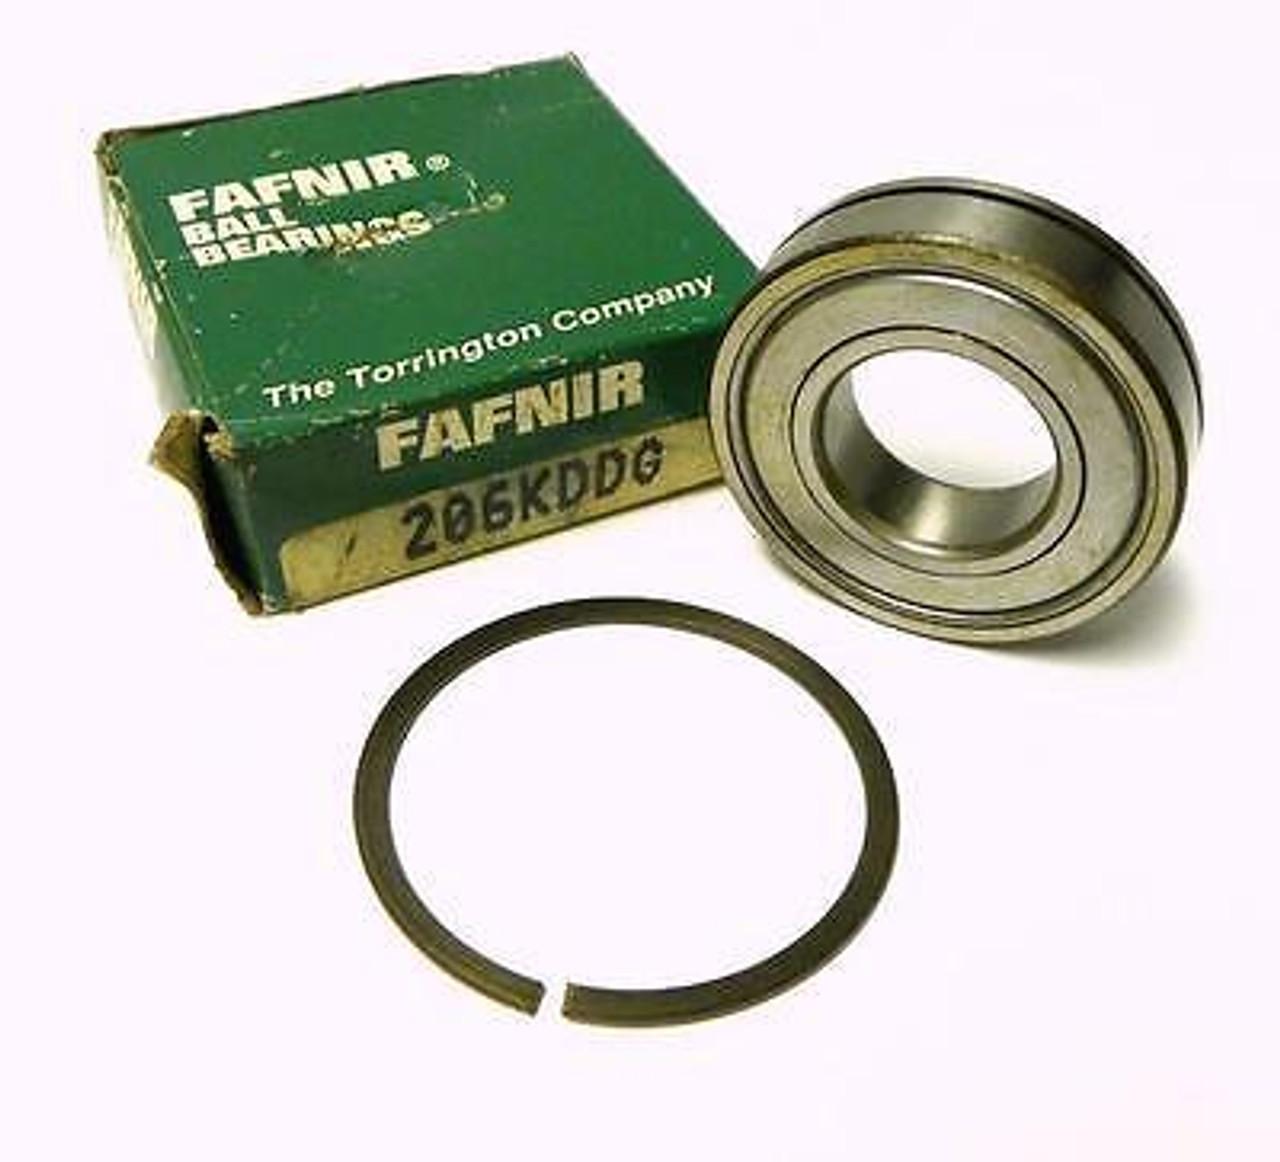 FAFNIR 210KG BEARING